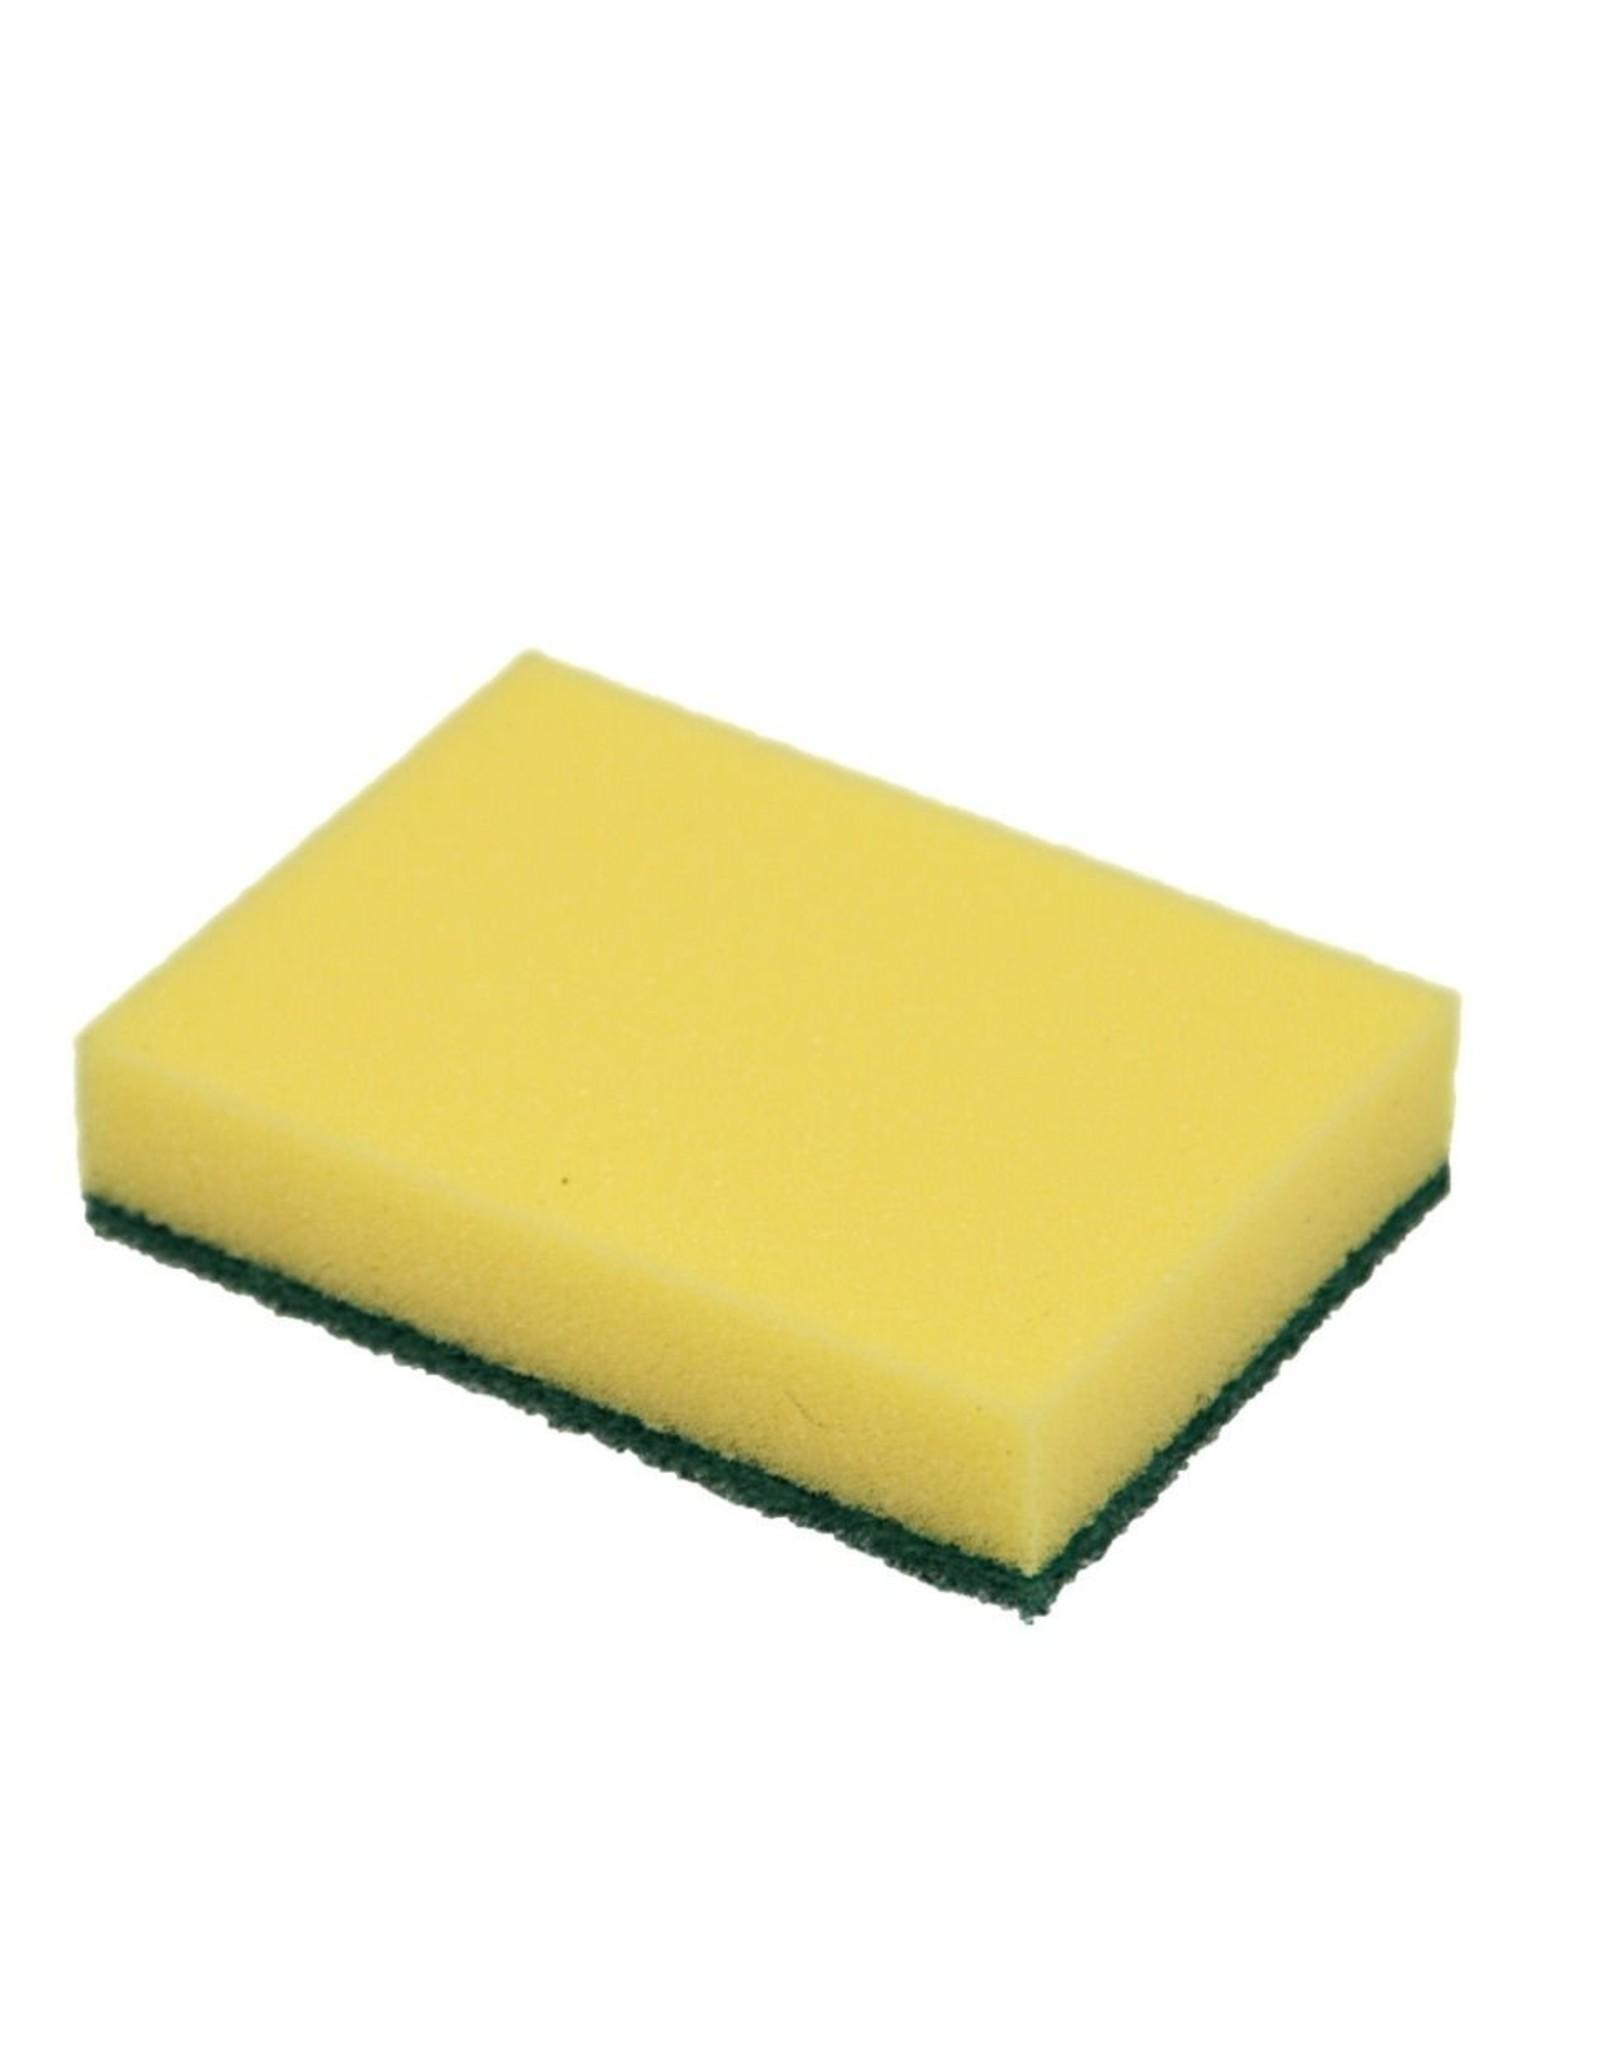 ACOR Reinigingsspons 10 stuks geel / groene pad. 14x10x3cm